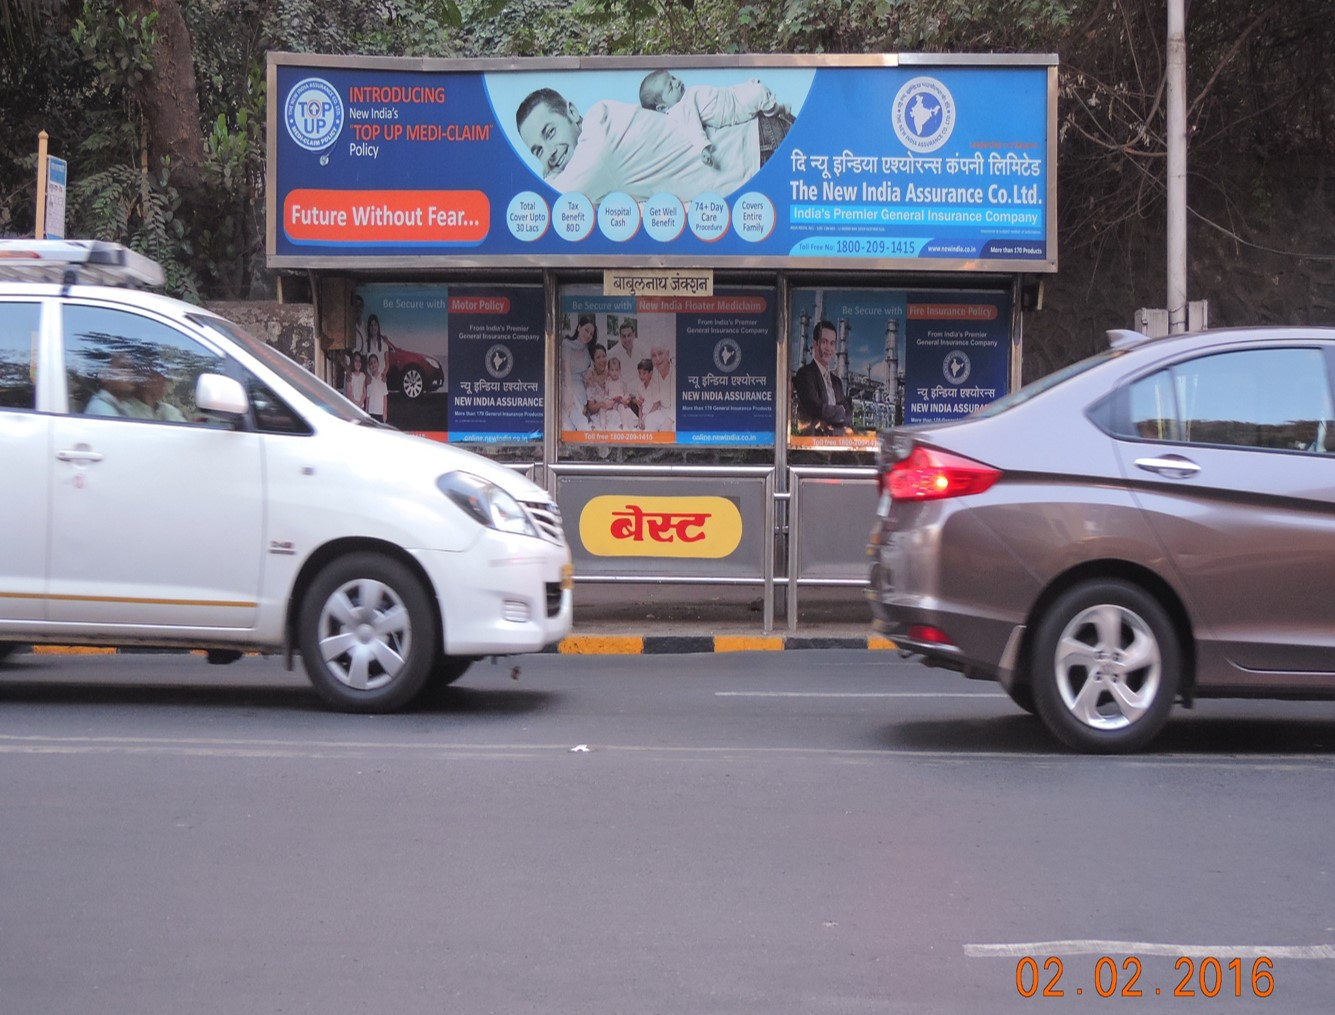 Hughes Road Befor Kemps Corner Up, Mumbai